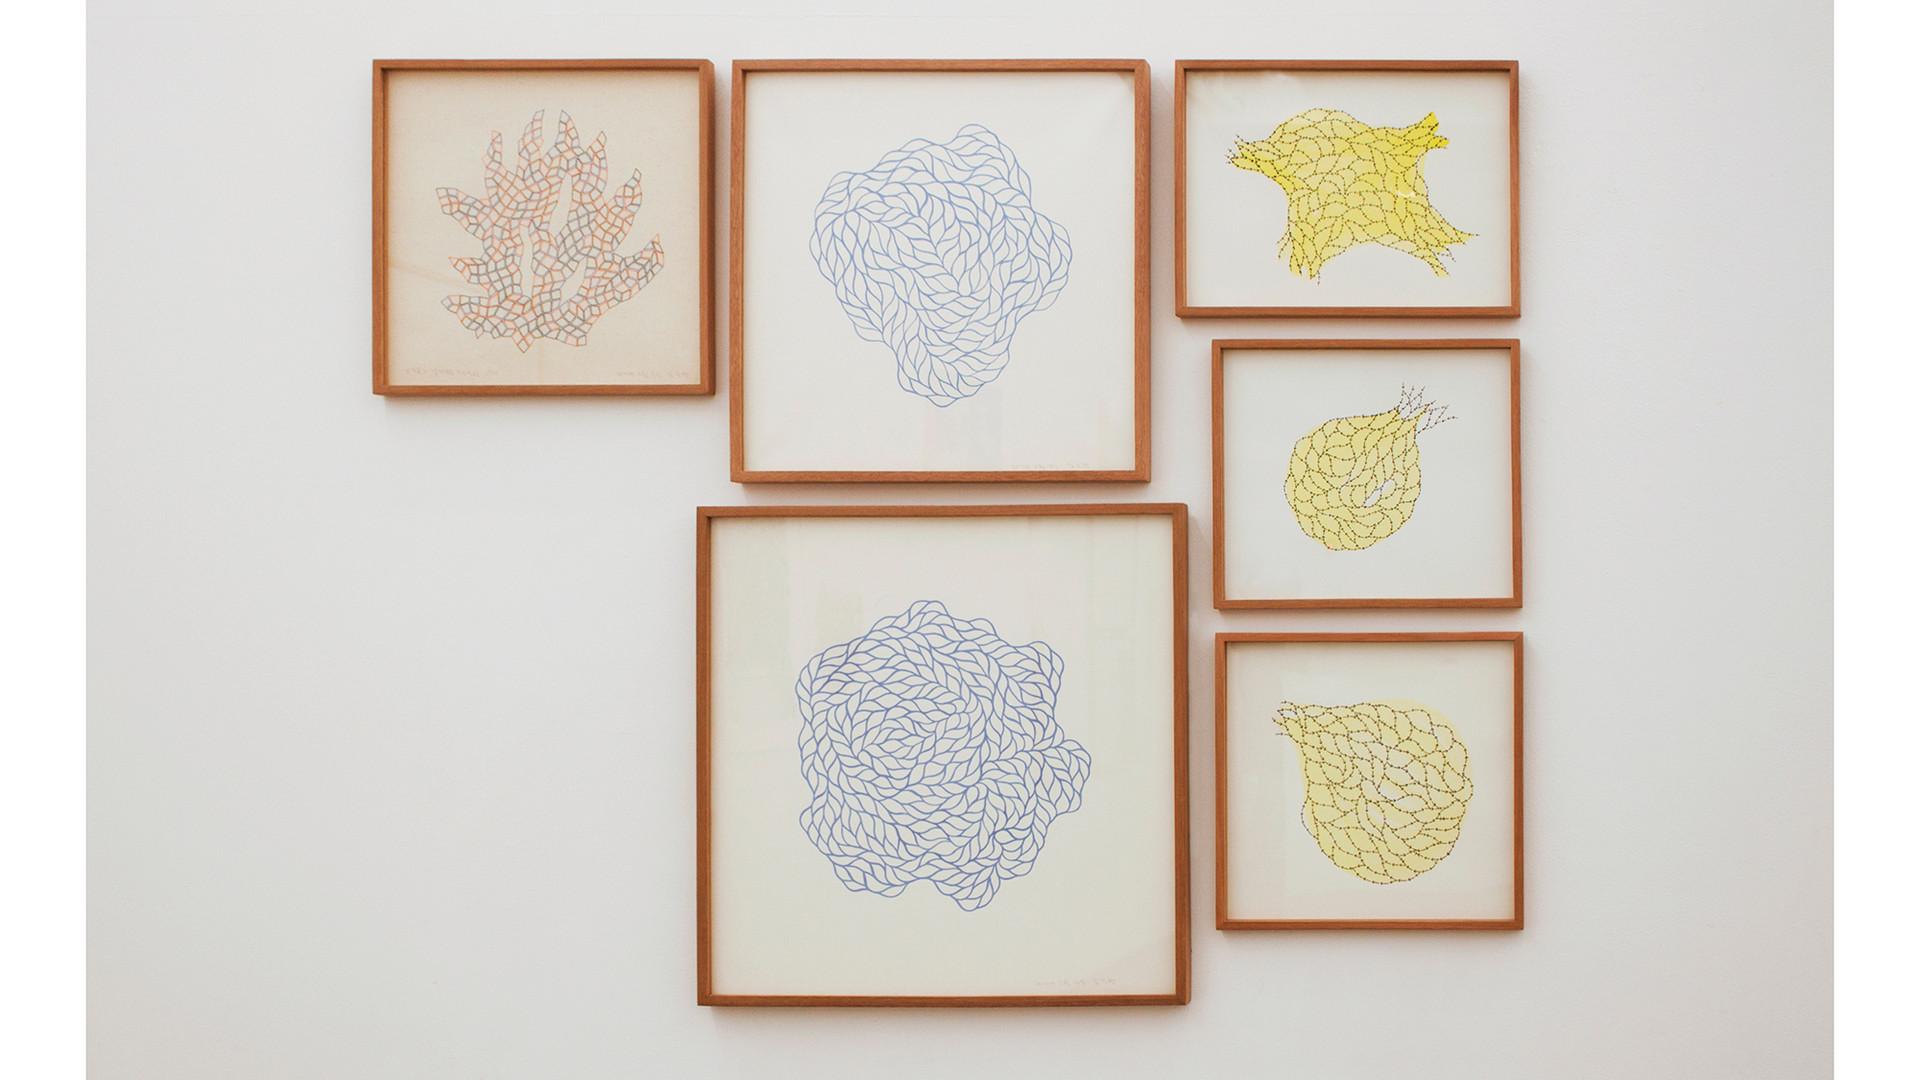 Joohyun Kim, Installation View at Your Hand, My Heart, Gallery Simon, 2017